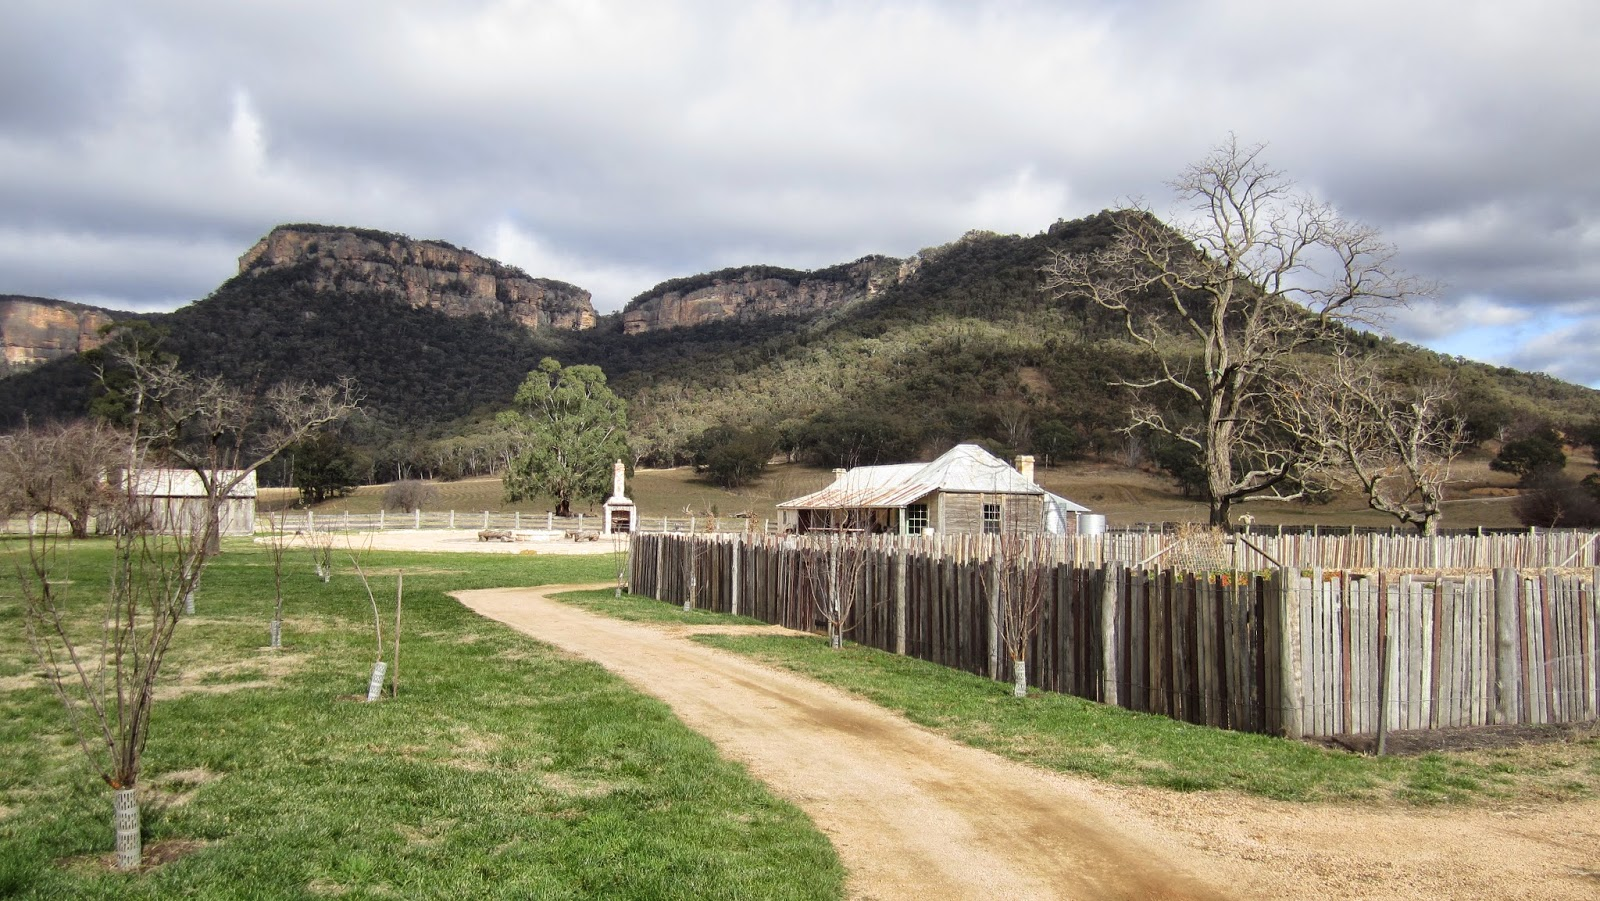 """Heritage Suites"" at Wolgan Valley nsw australia"